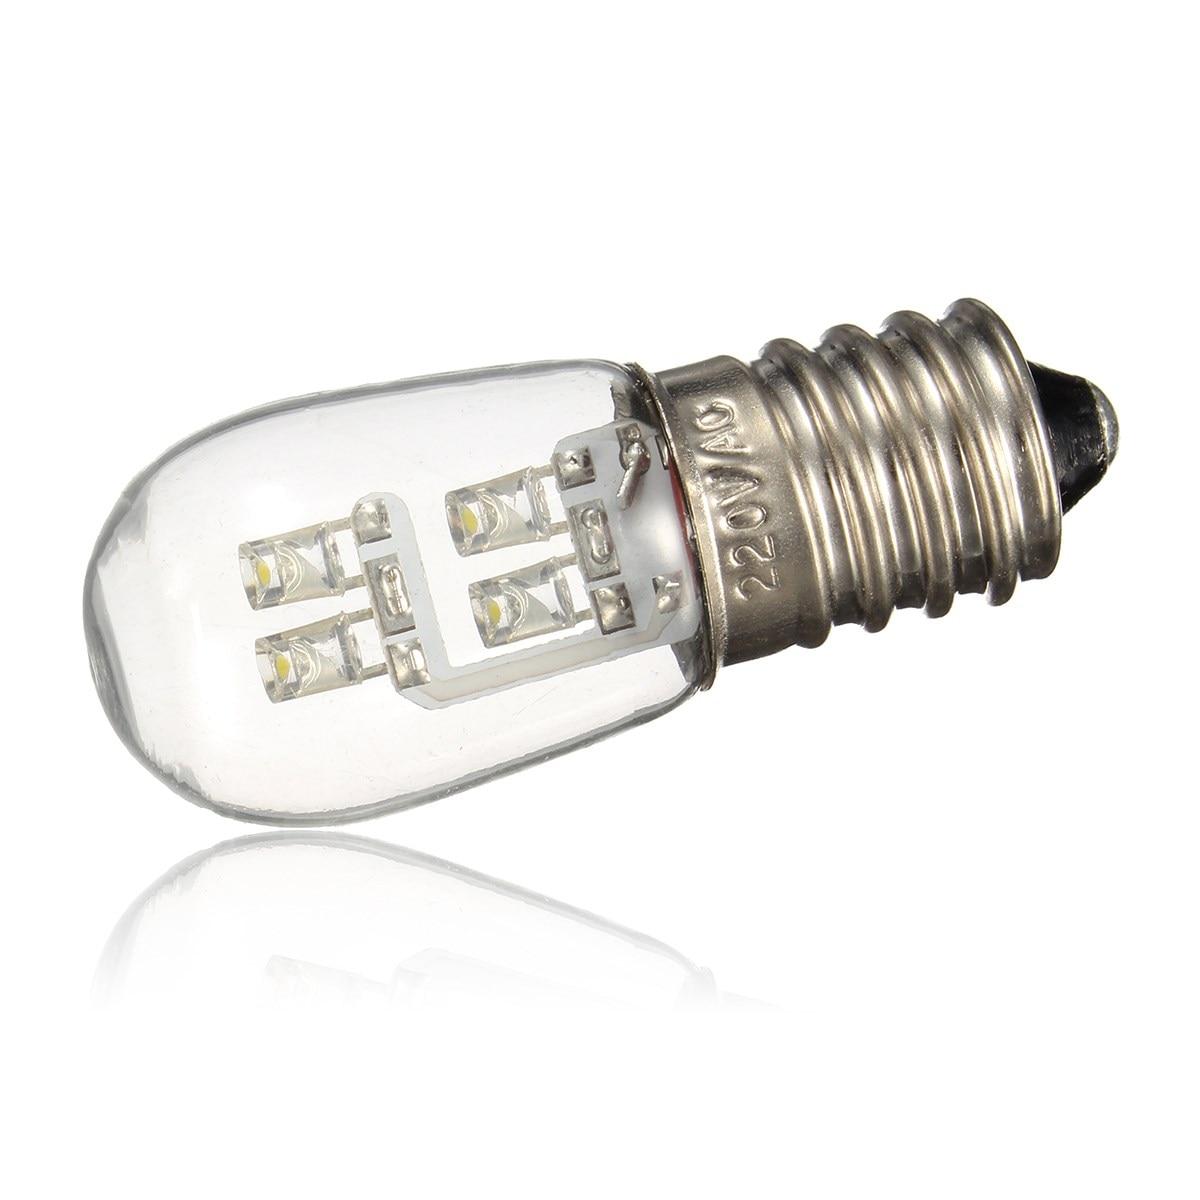 0.5W 4 LED Light Bulb E12 E14 Base Candelabra Candle Bulb LED Lamp ...